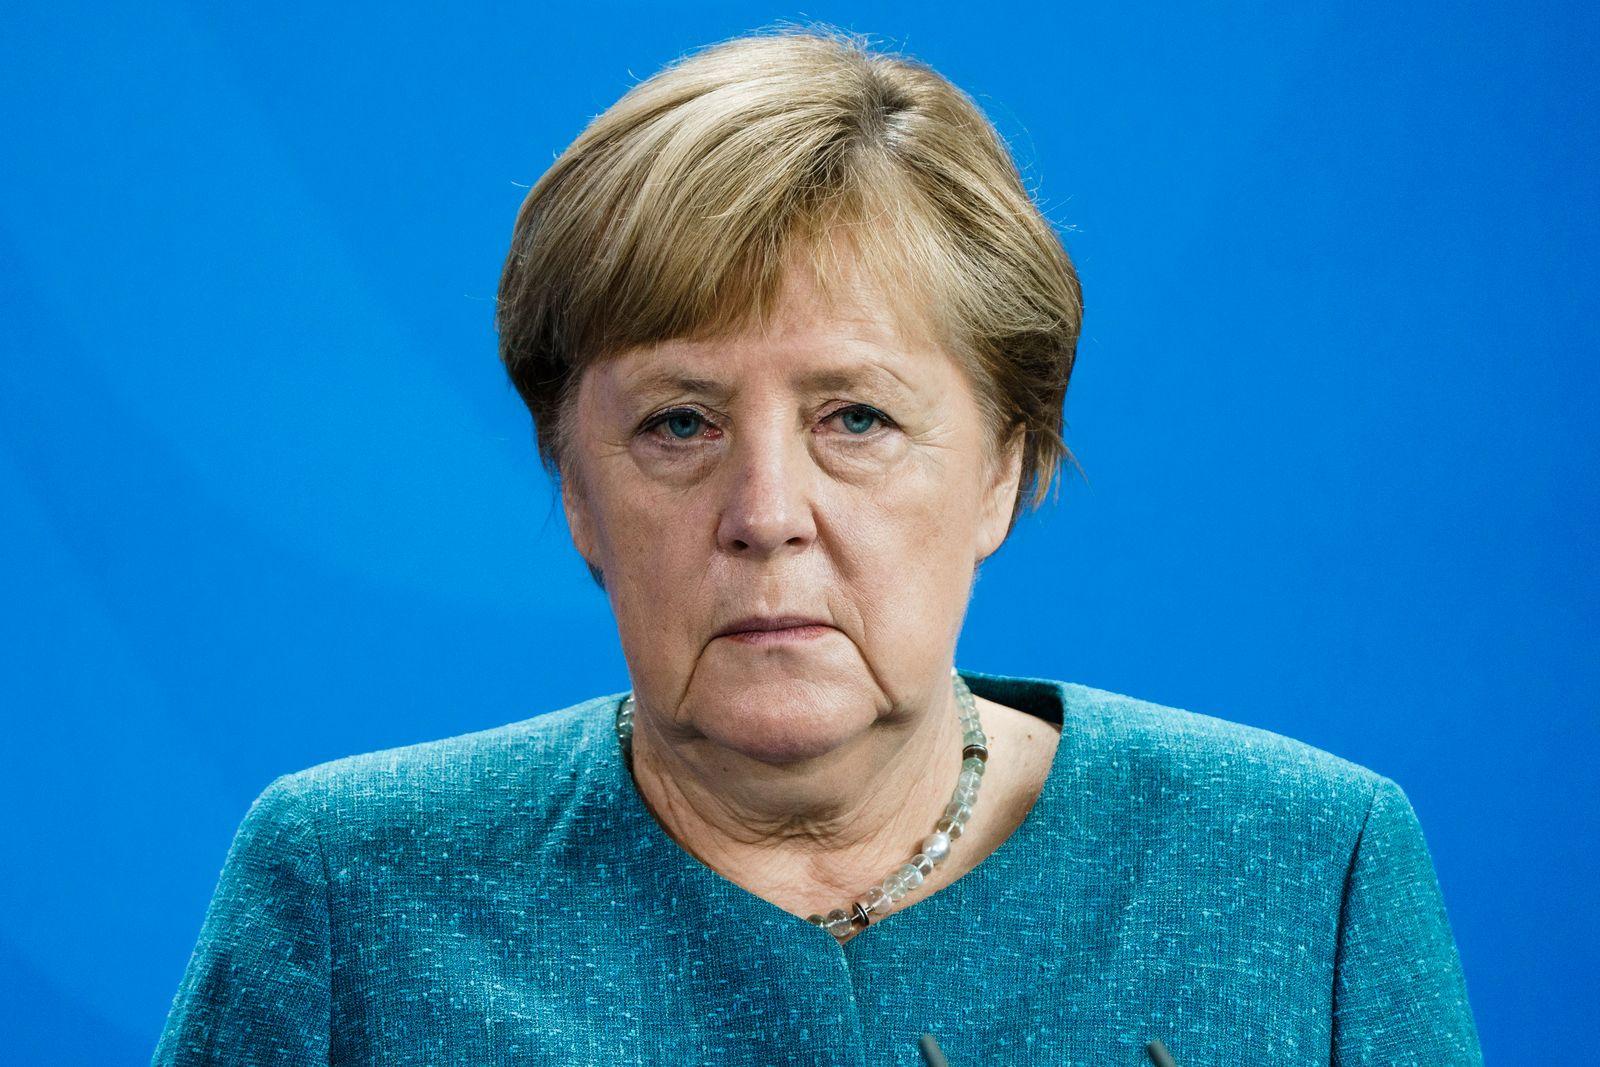 German Chancellor Angela Merkel receives Buber-Rosenzweig medal